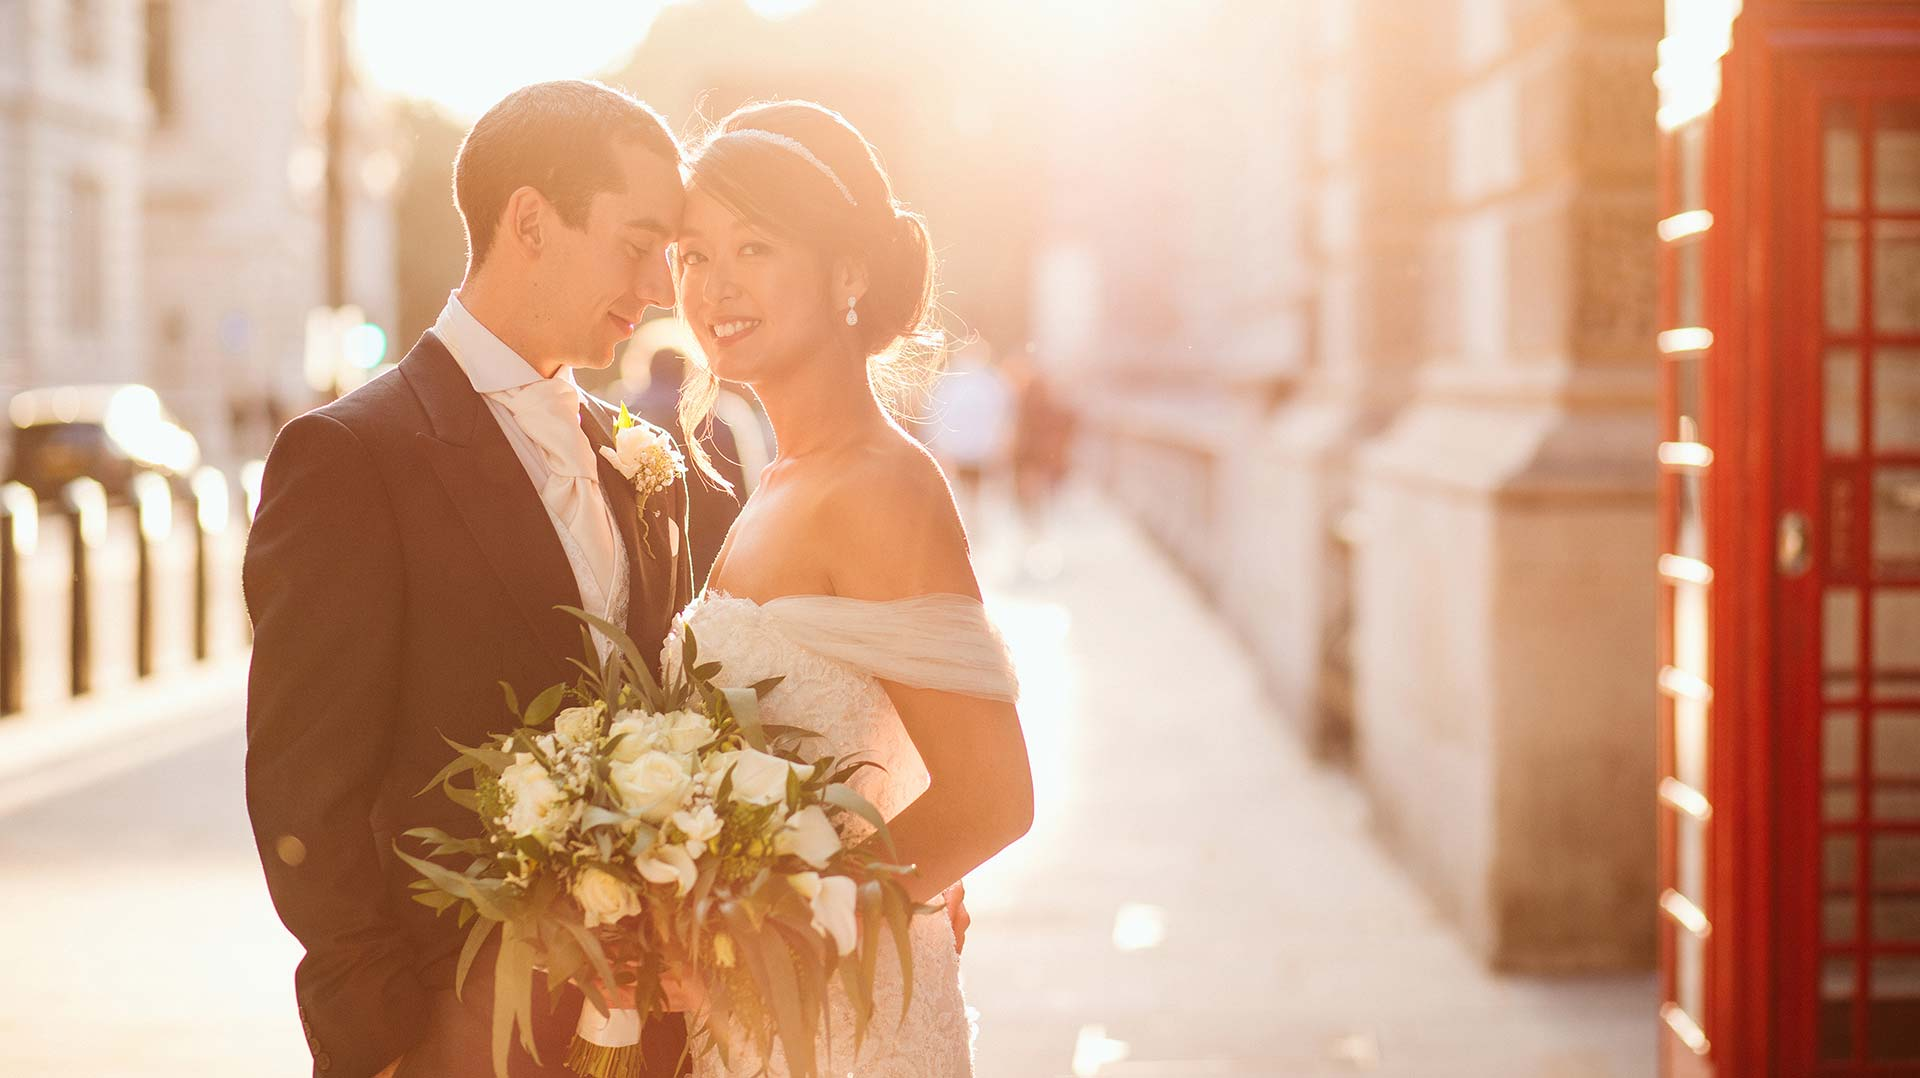 Documentary Wedding Photographer London UK Destination